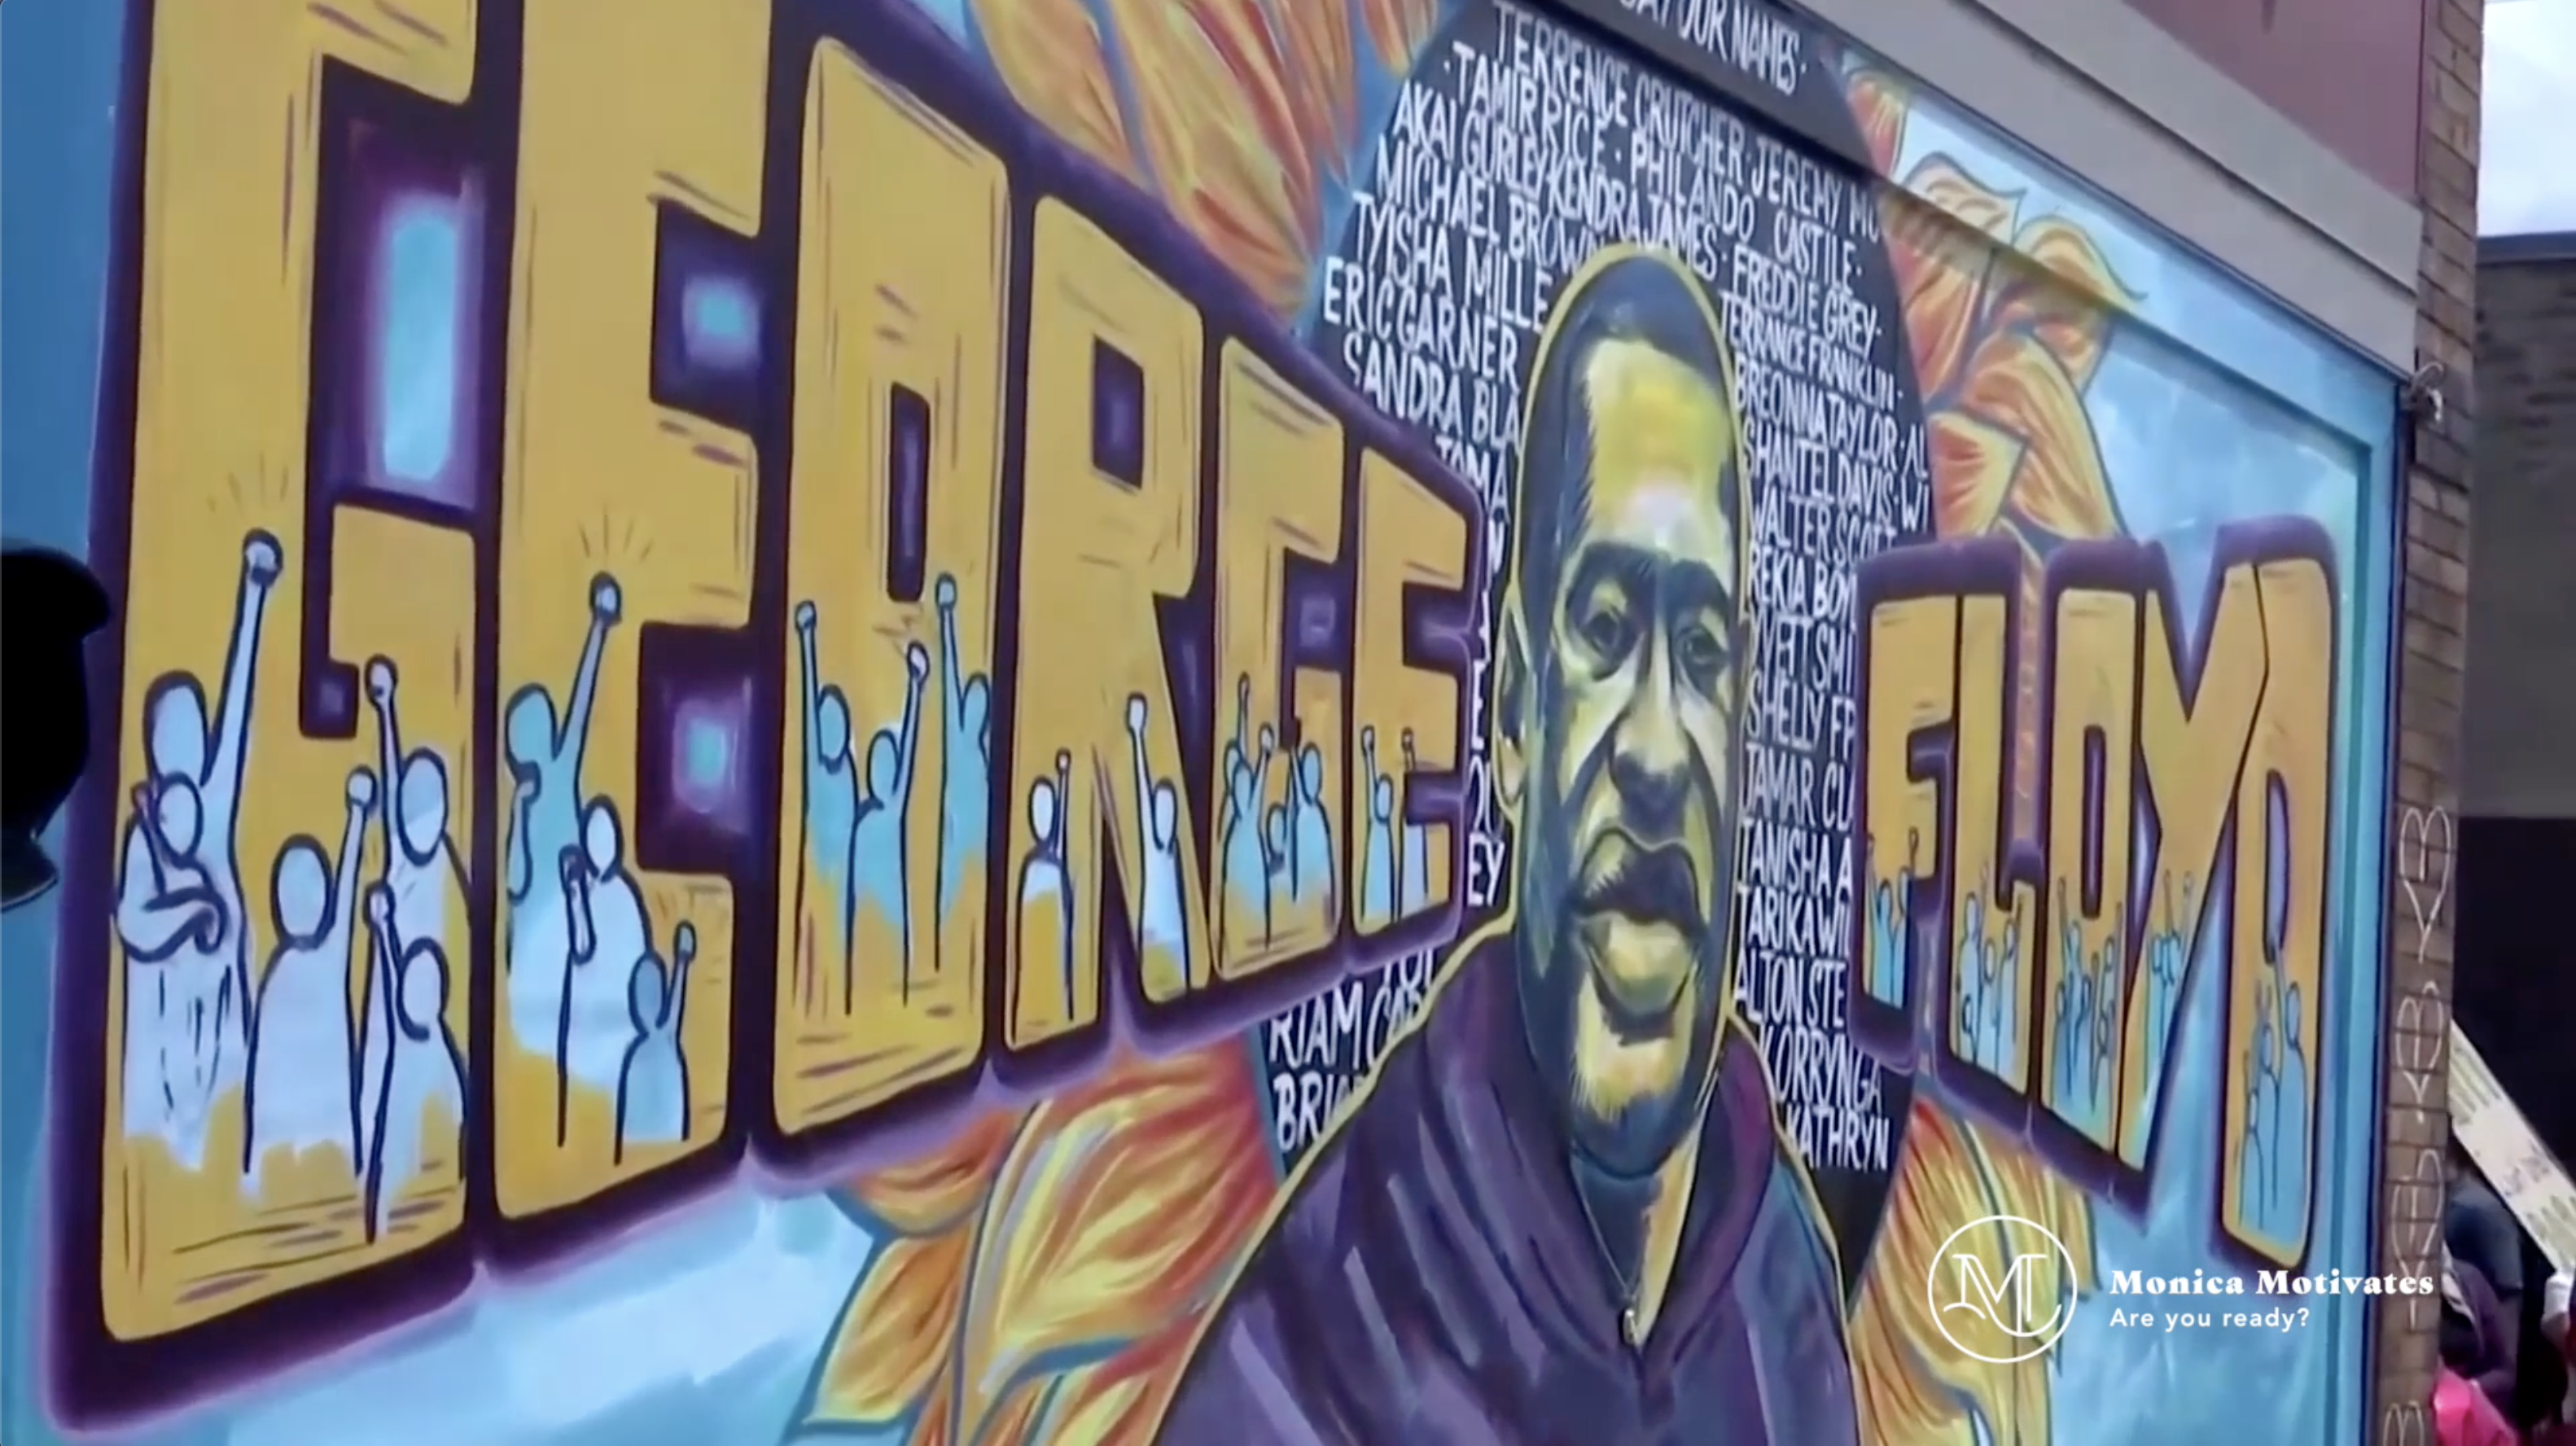 George-floyd-mural-honor-monica-motivates